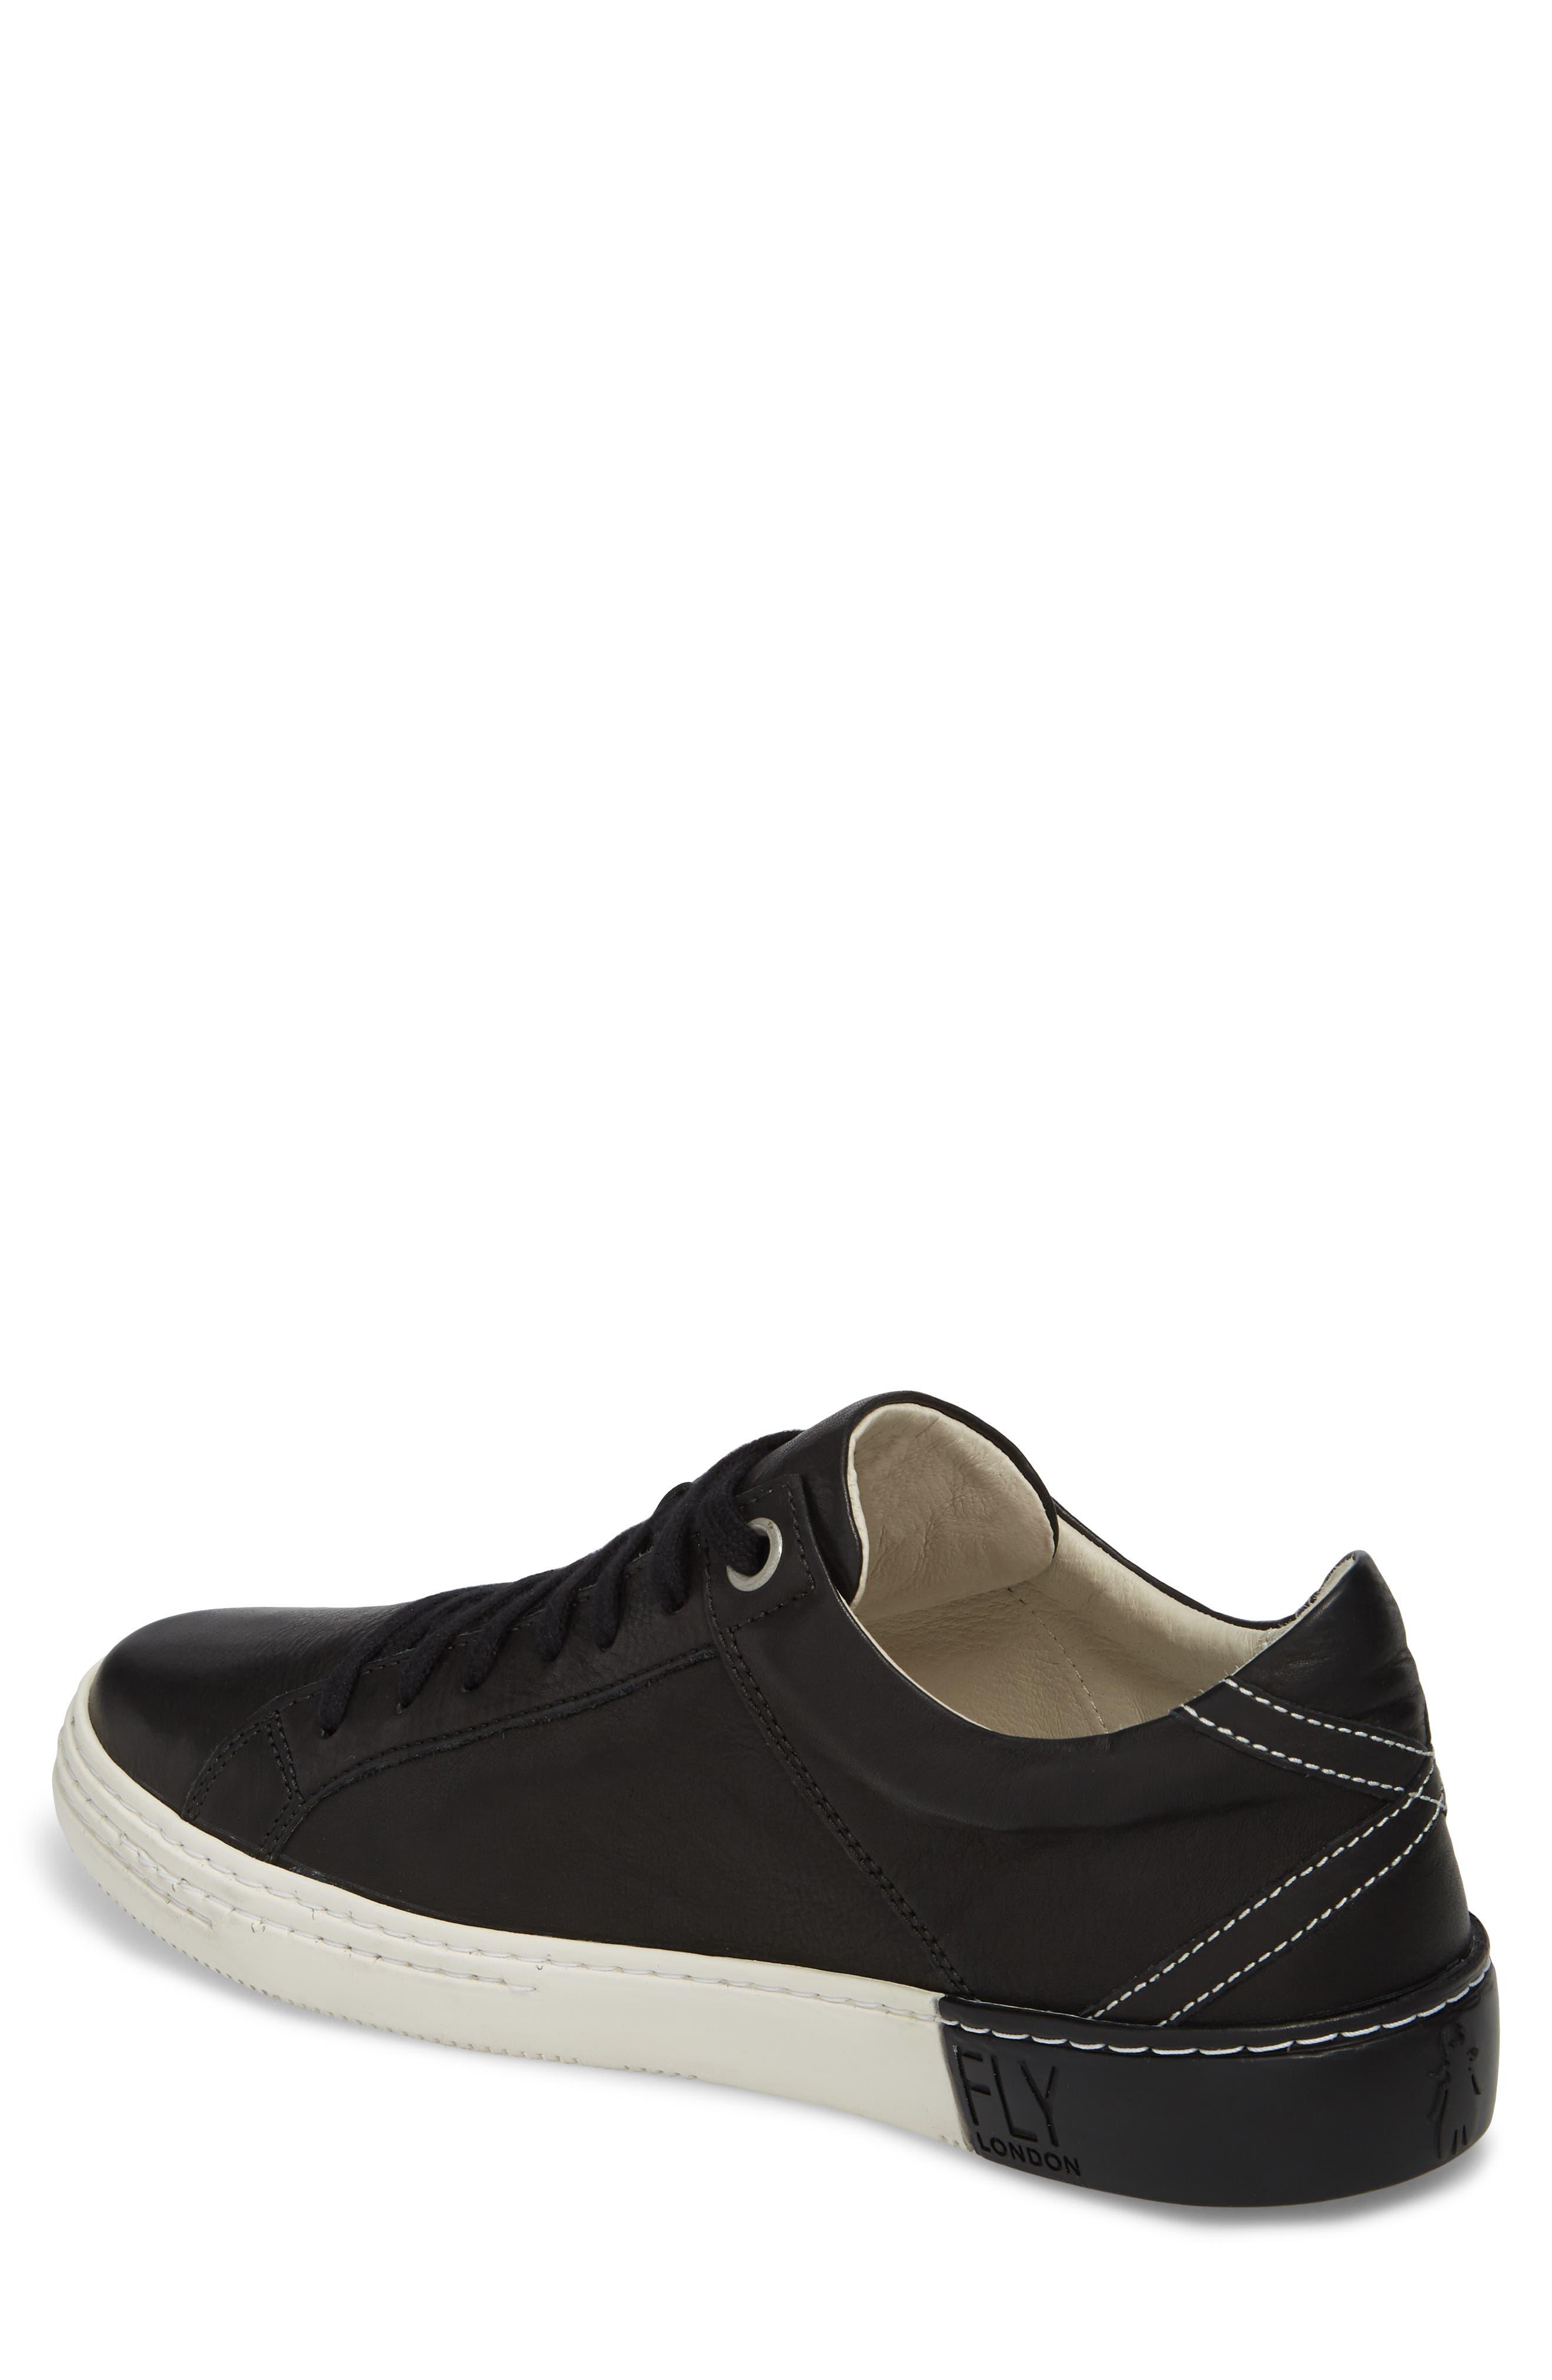 Sene Low Top Sneaker,                             Alternate thumbnail 2, color,                             BLACK LEATHER